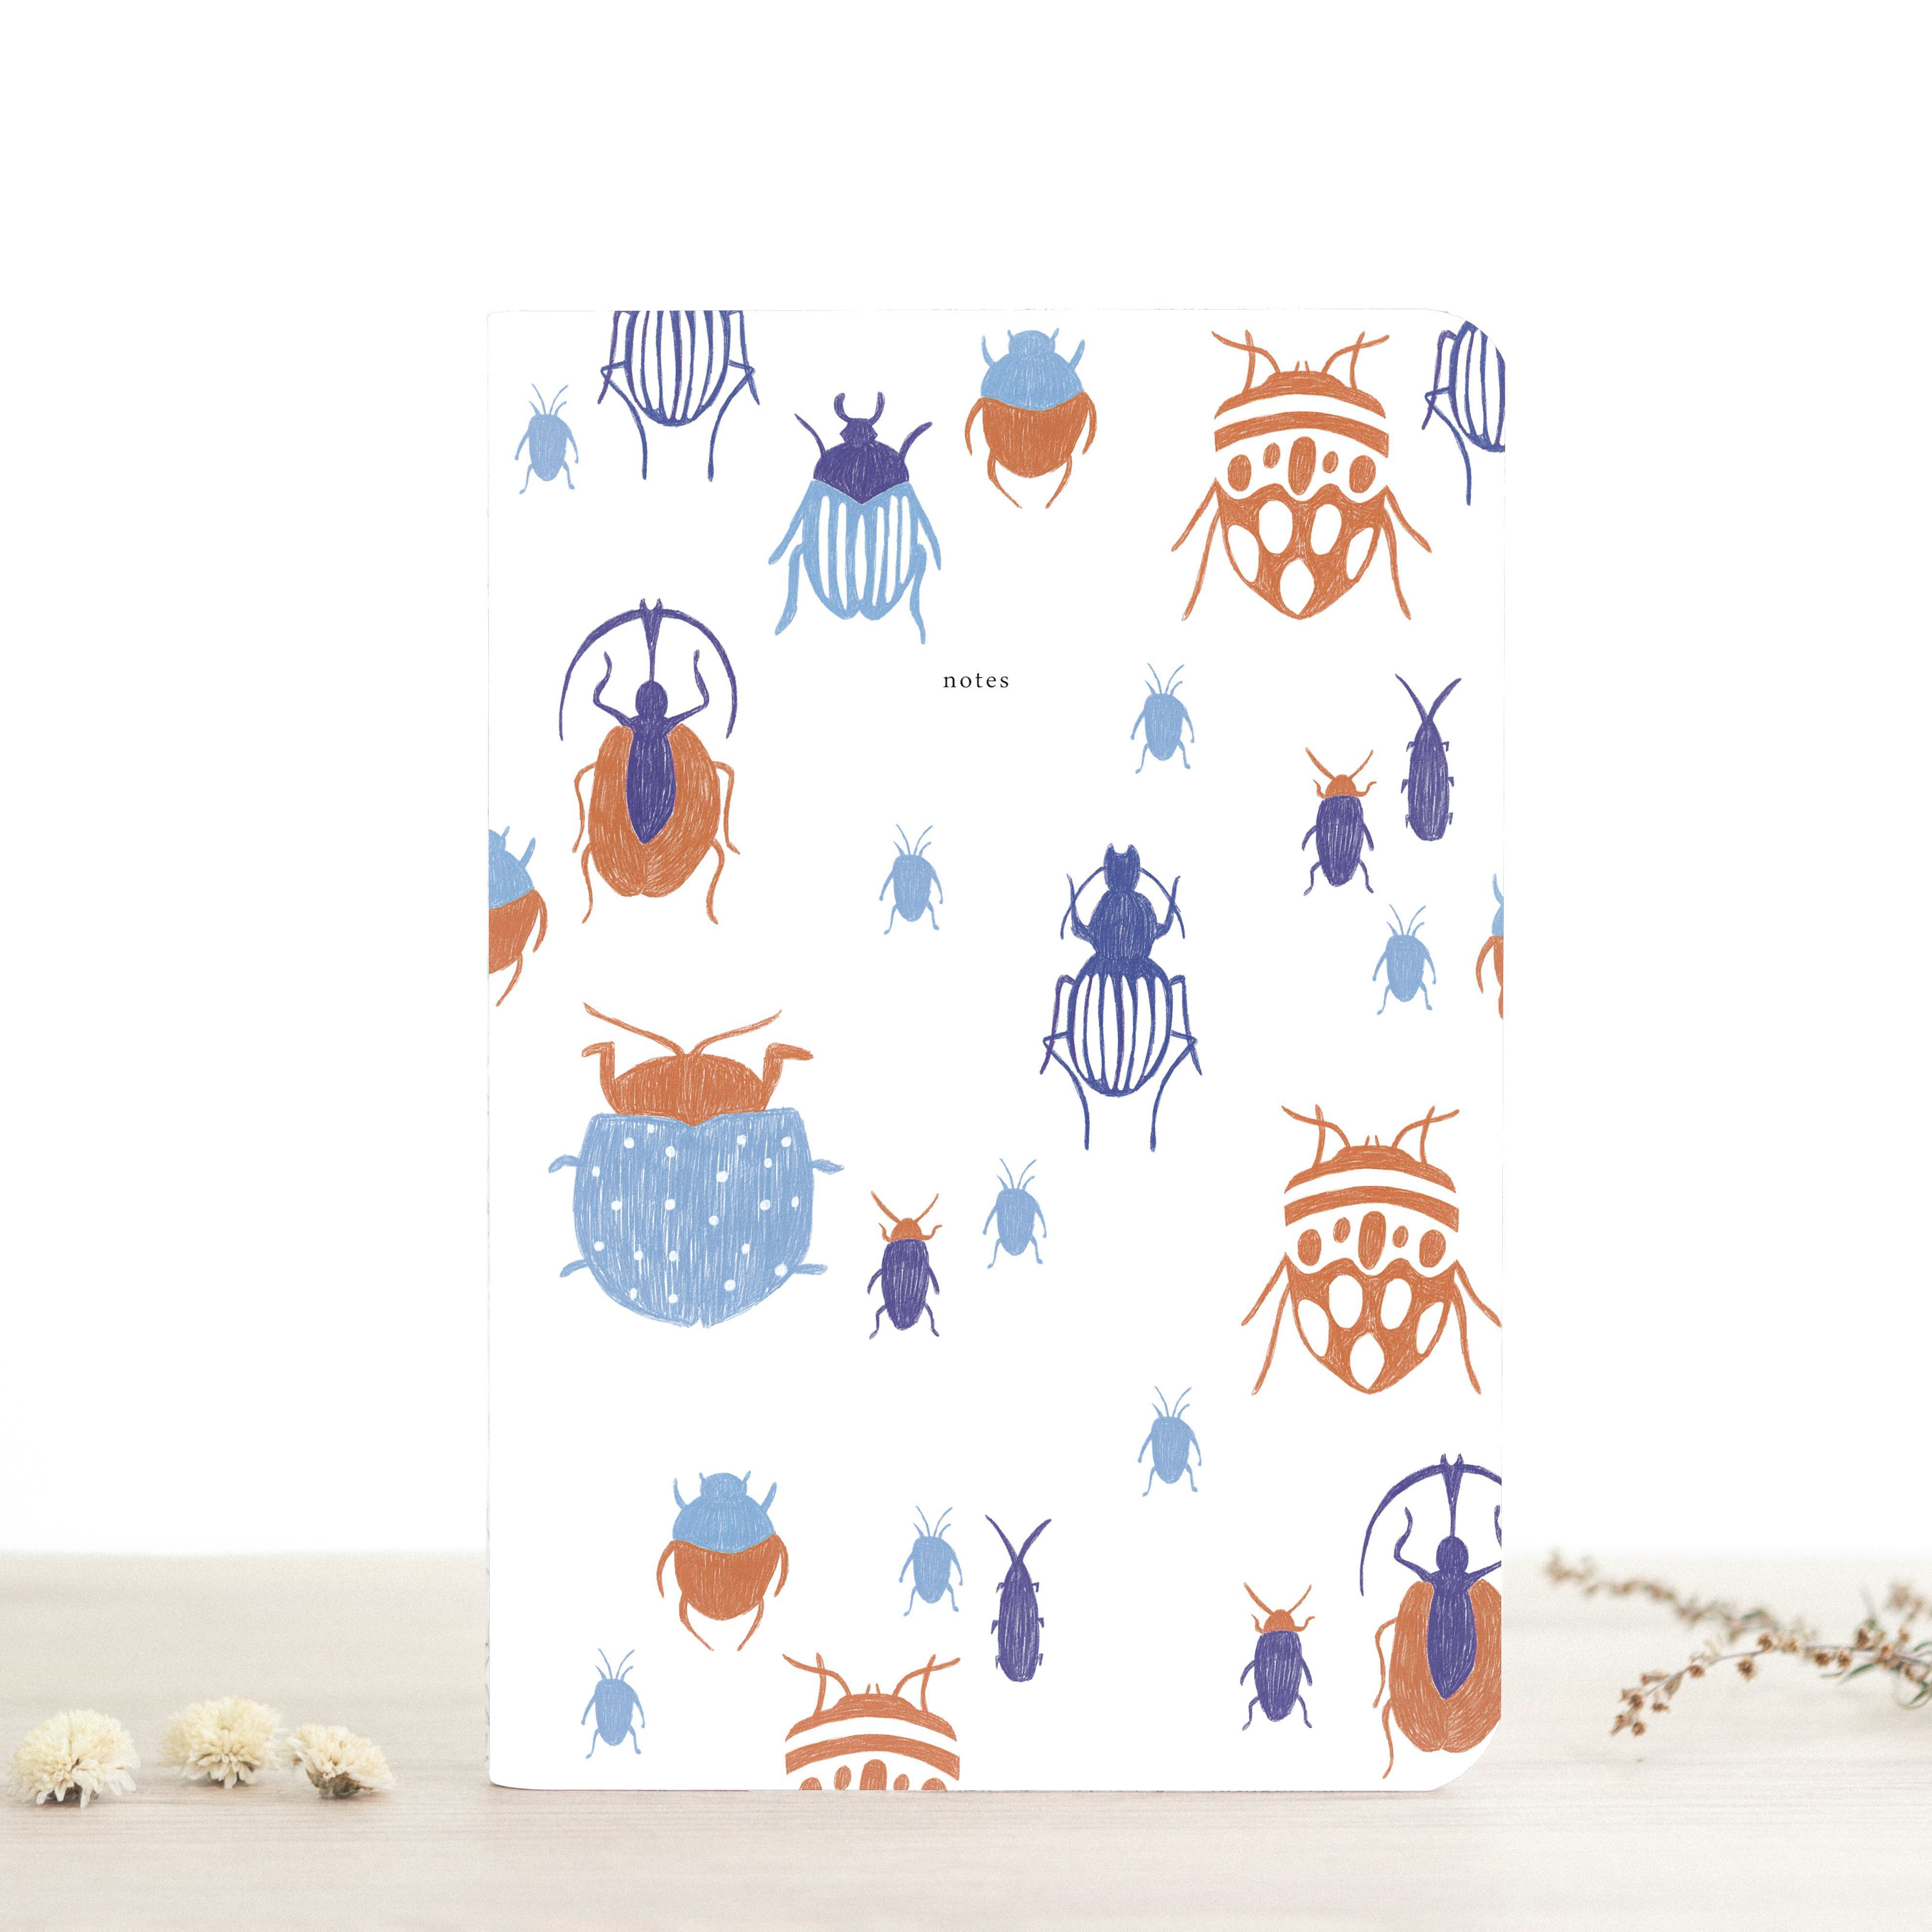 Atelier Bobbie A5 Notebook - Edouard - Ruled